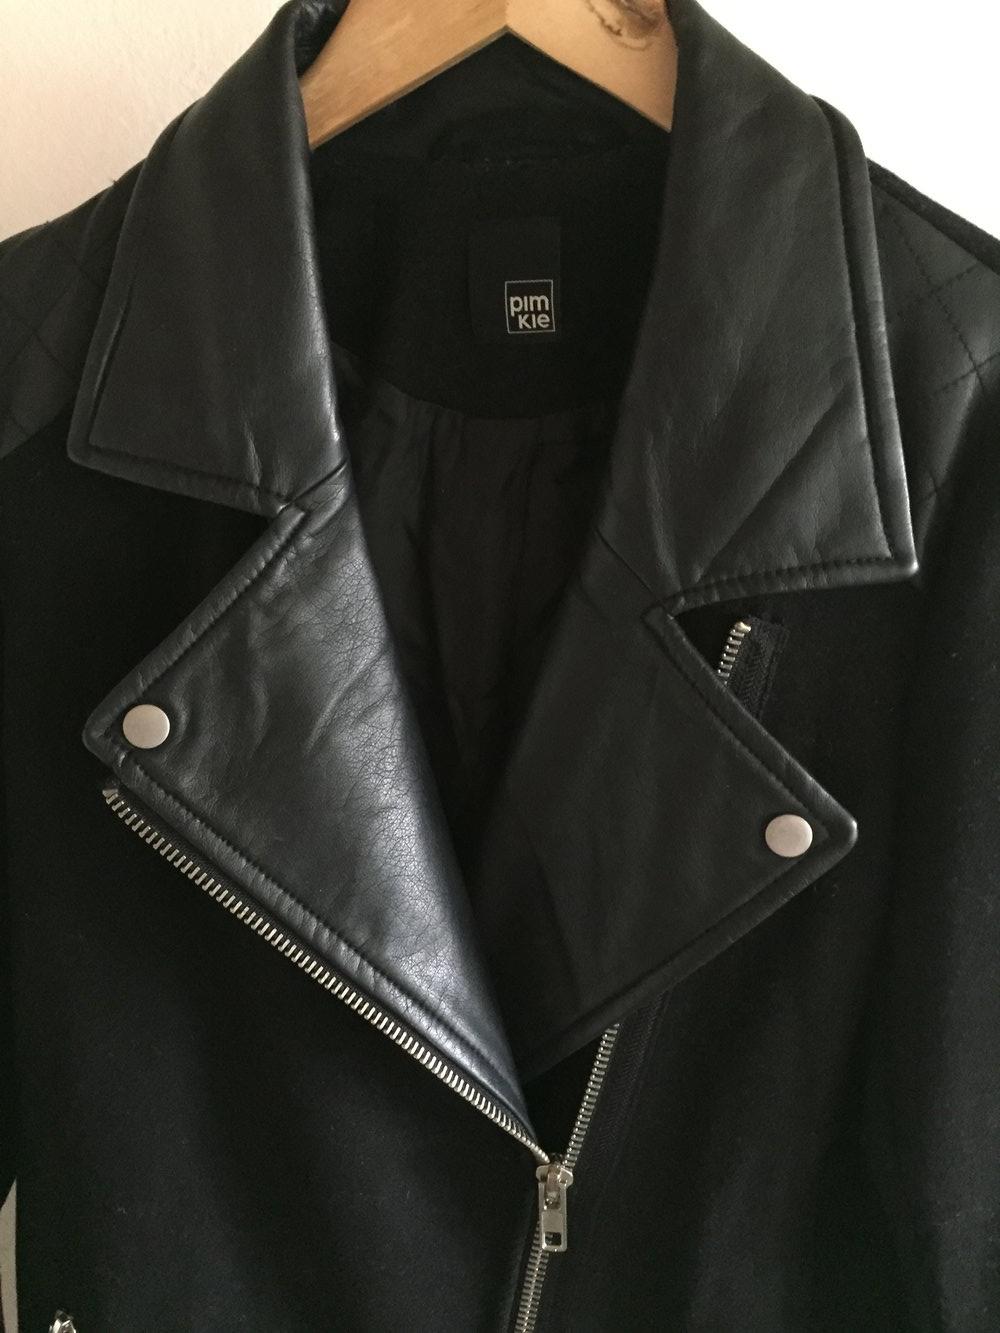 Pimkie schwarzer langer wintermantel for Schwarzer langer mantel